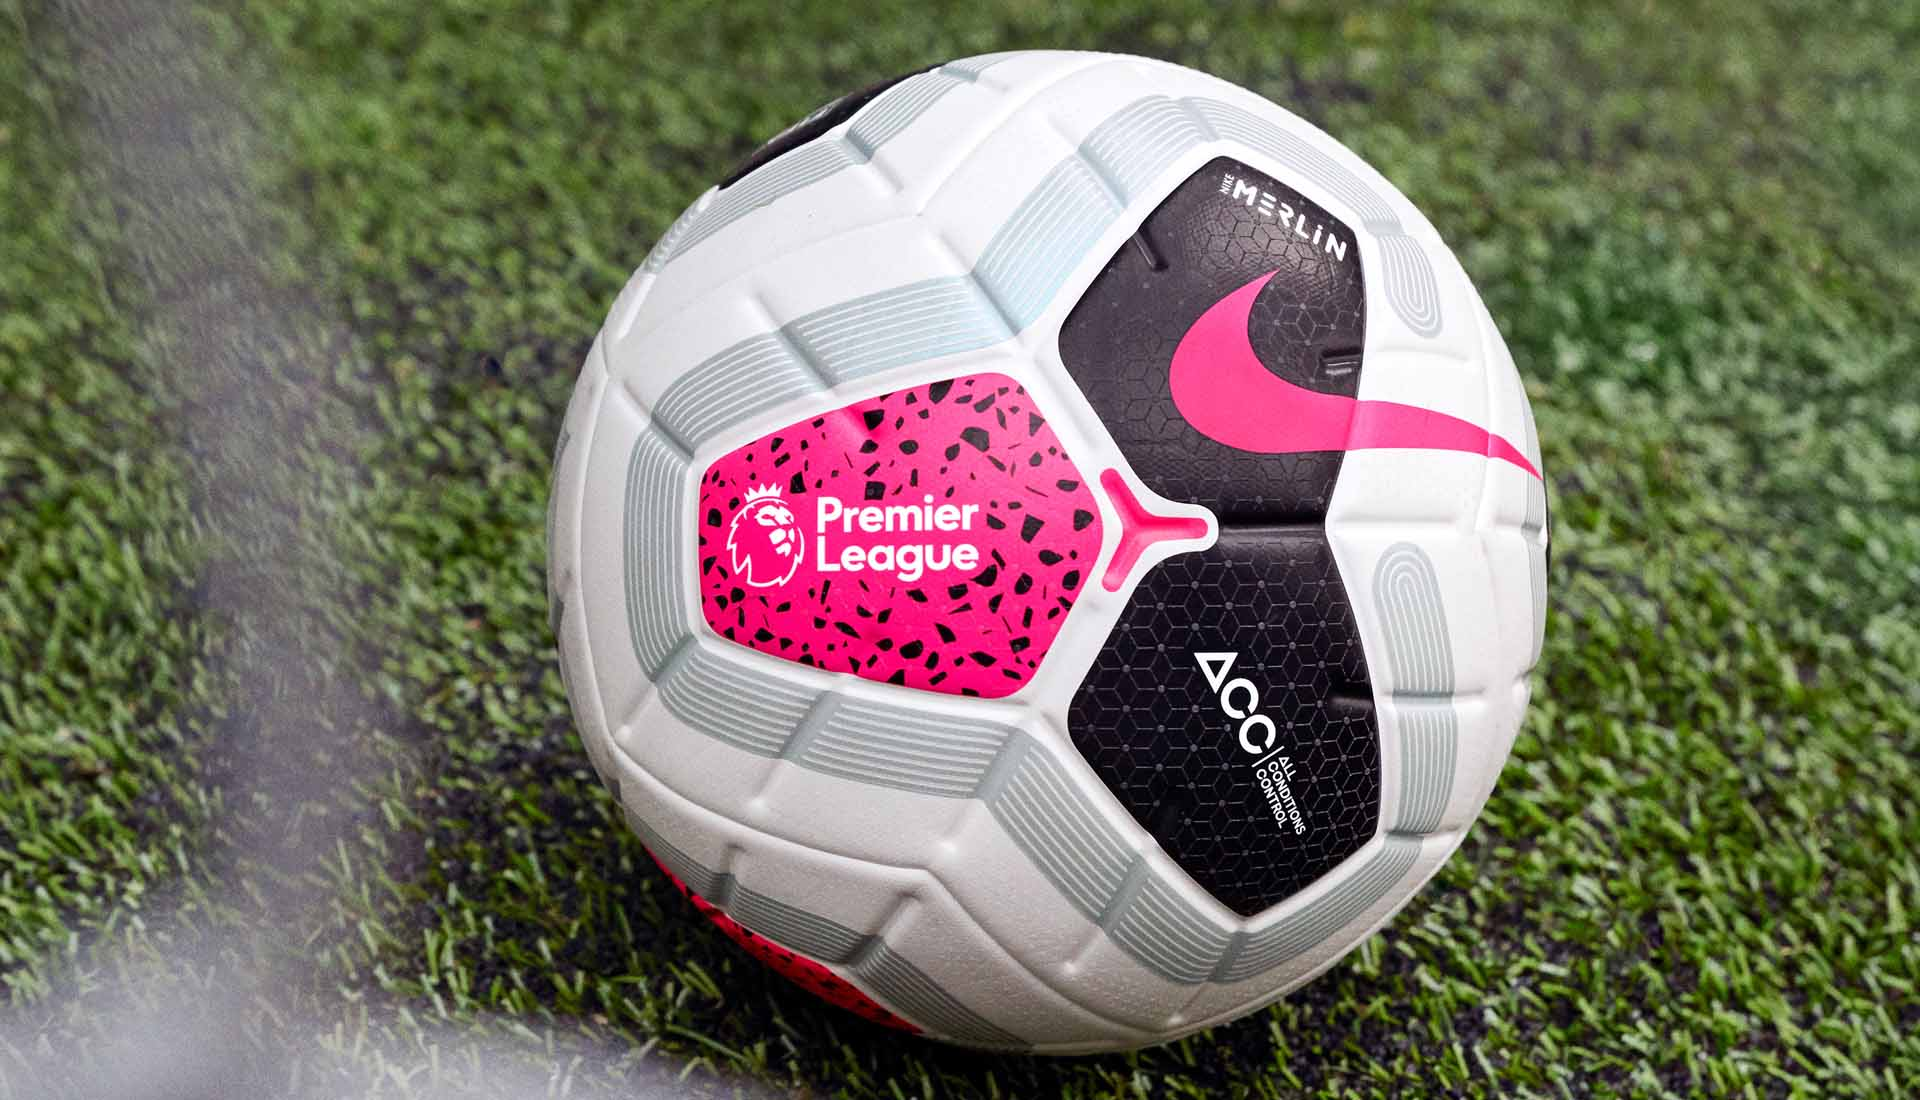 Мяч Премьер Лиги Nike Merlin 2019/20